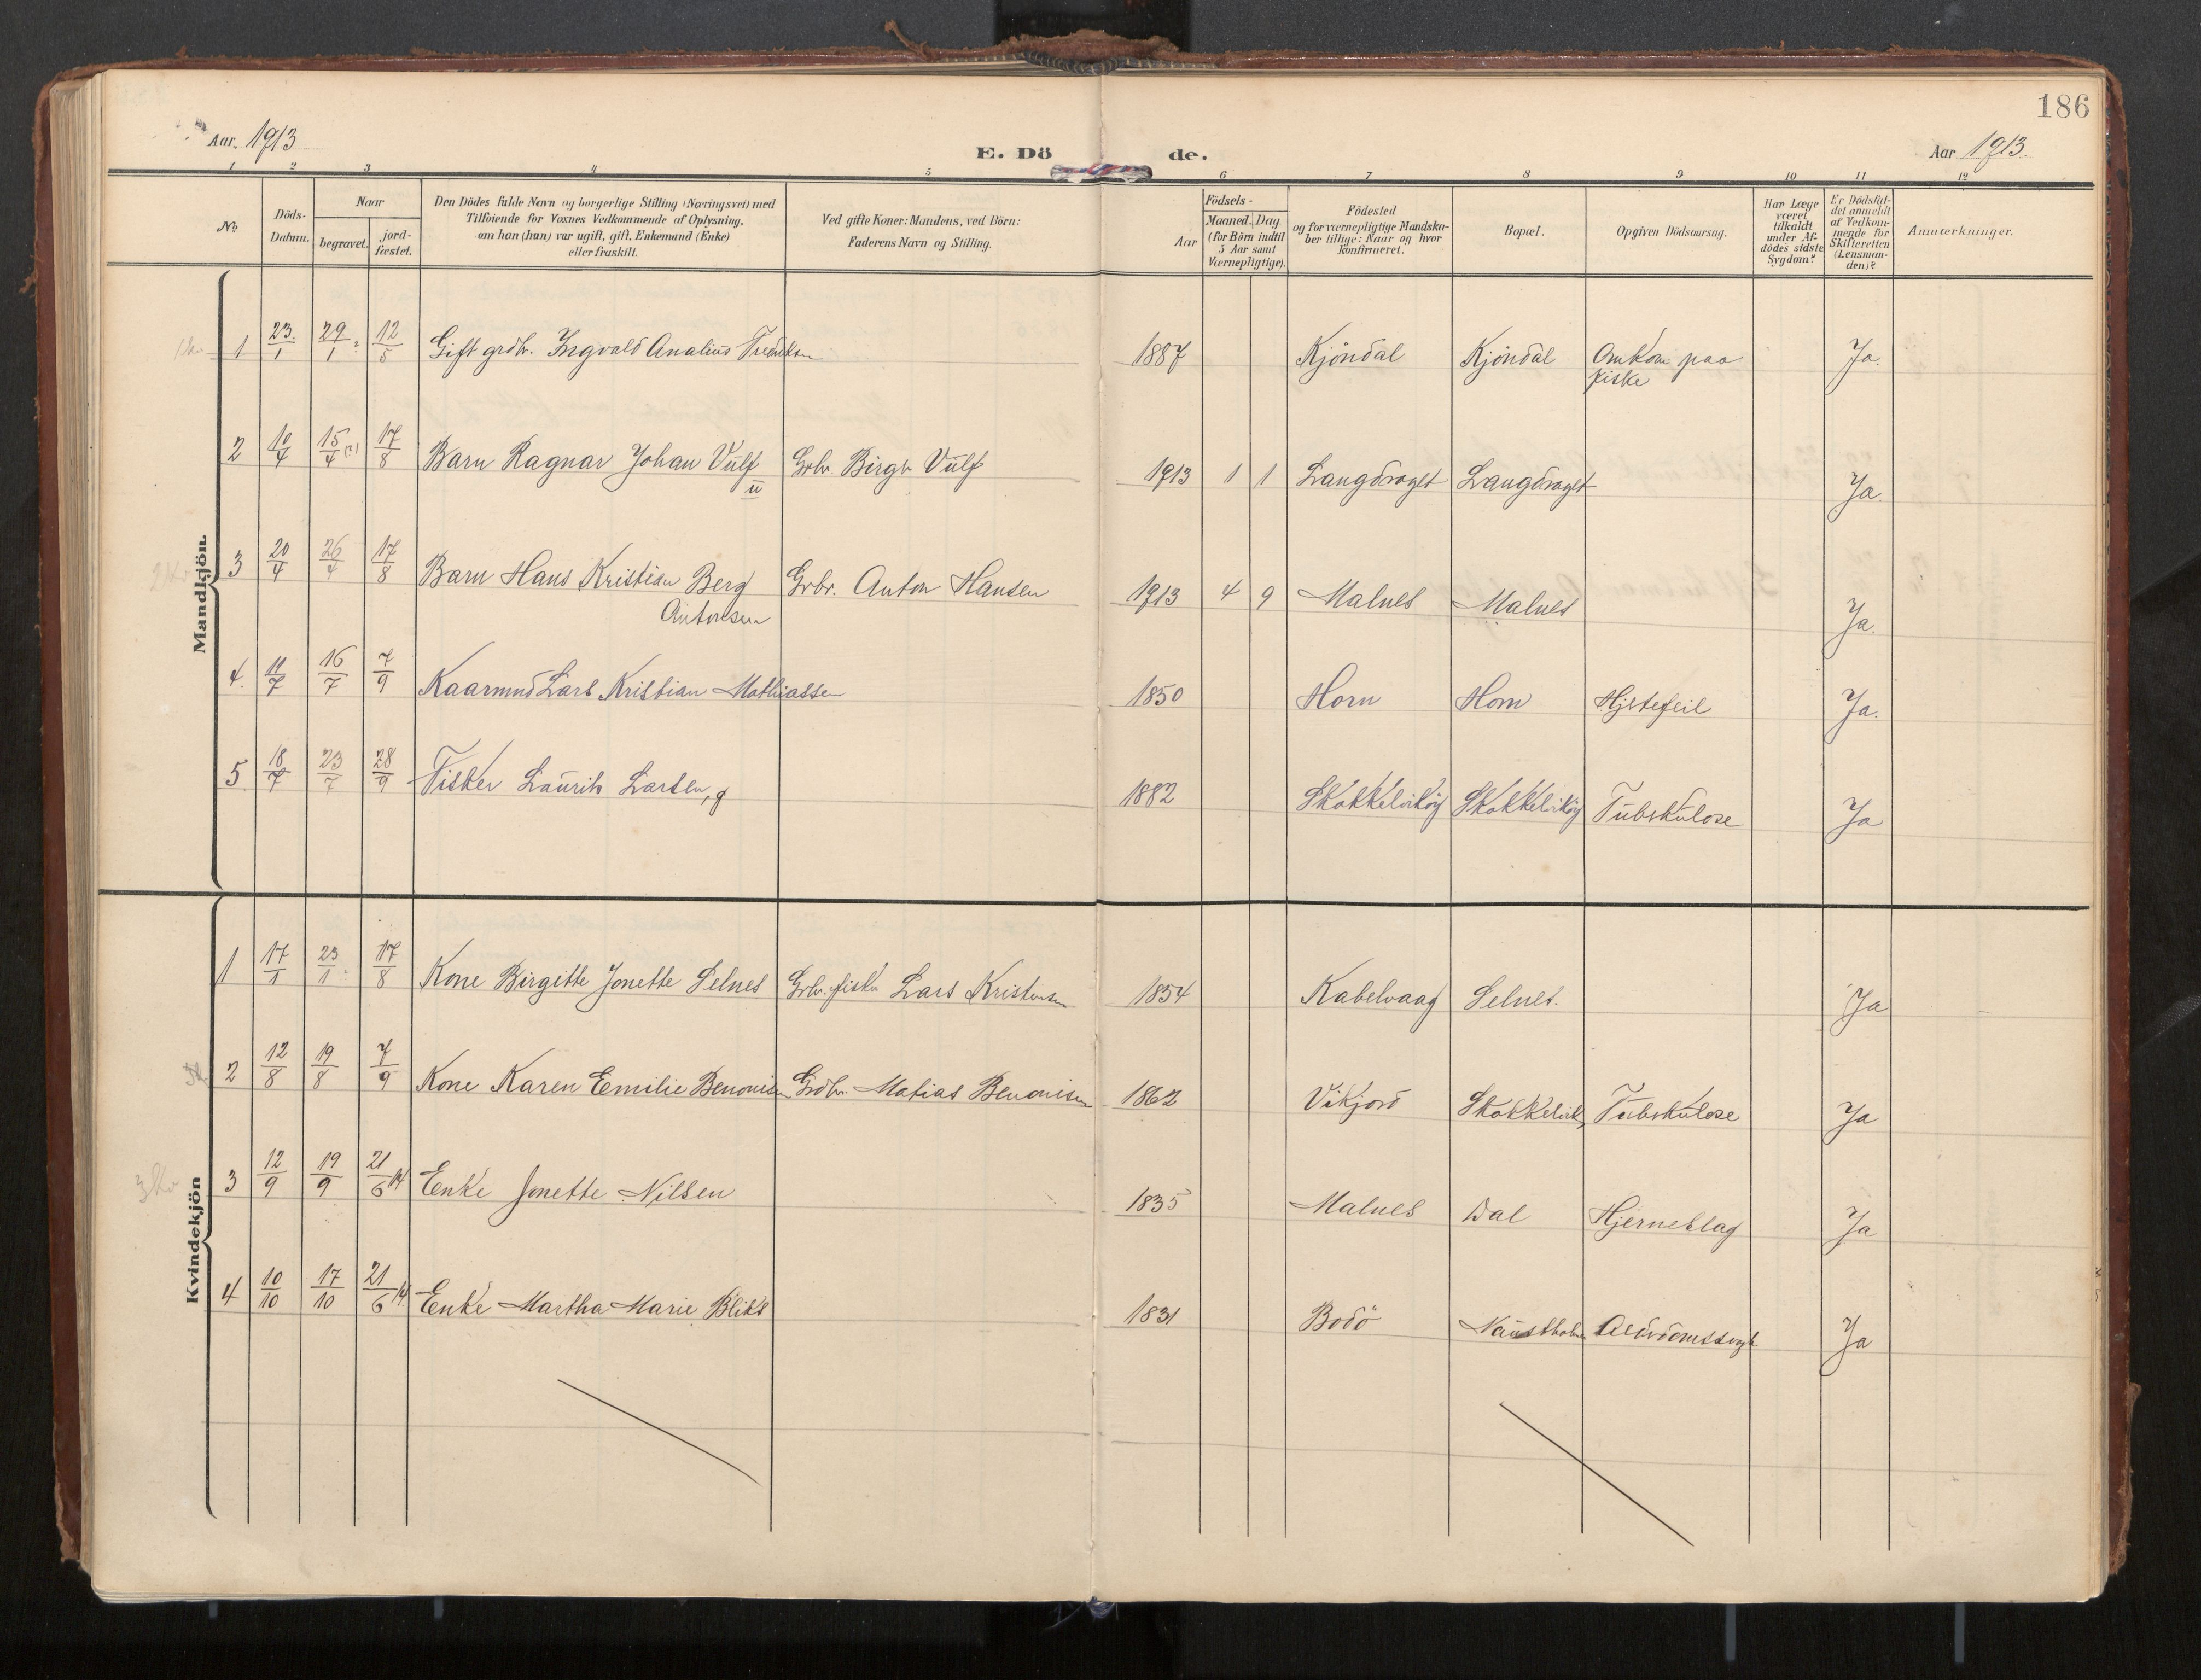 SAT, Ministerialprotokoller, klokkerbøker og fødselsregistre - Nordland, 884/L1194: Ministerialbok nr. 884A02, 1906-1937, s. 186